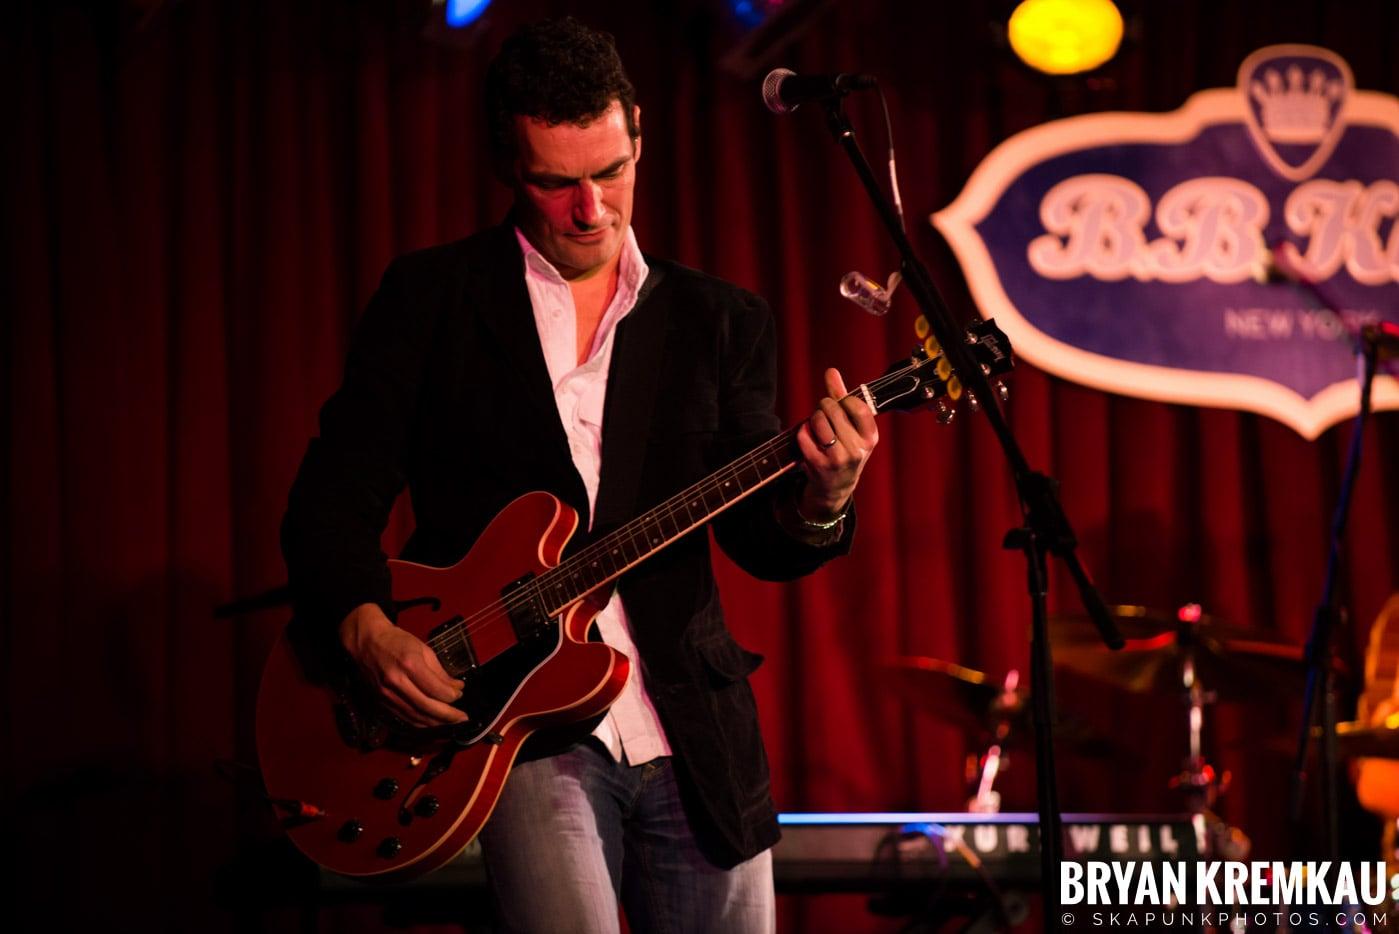 Alan Doyle @ B.B. King Blues & Grill, NYC - 1.11.13 (18)